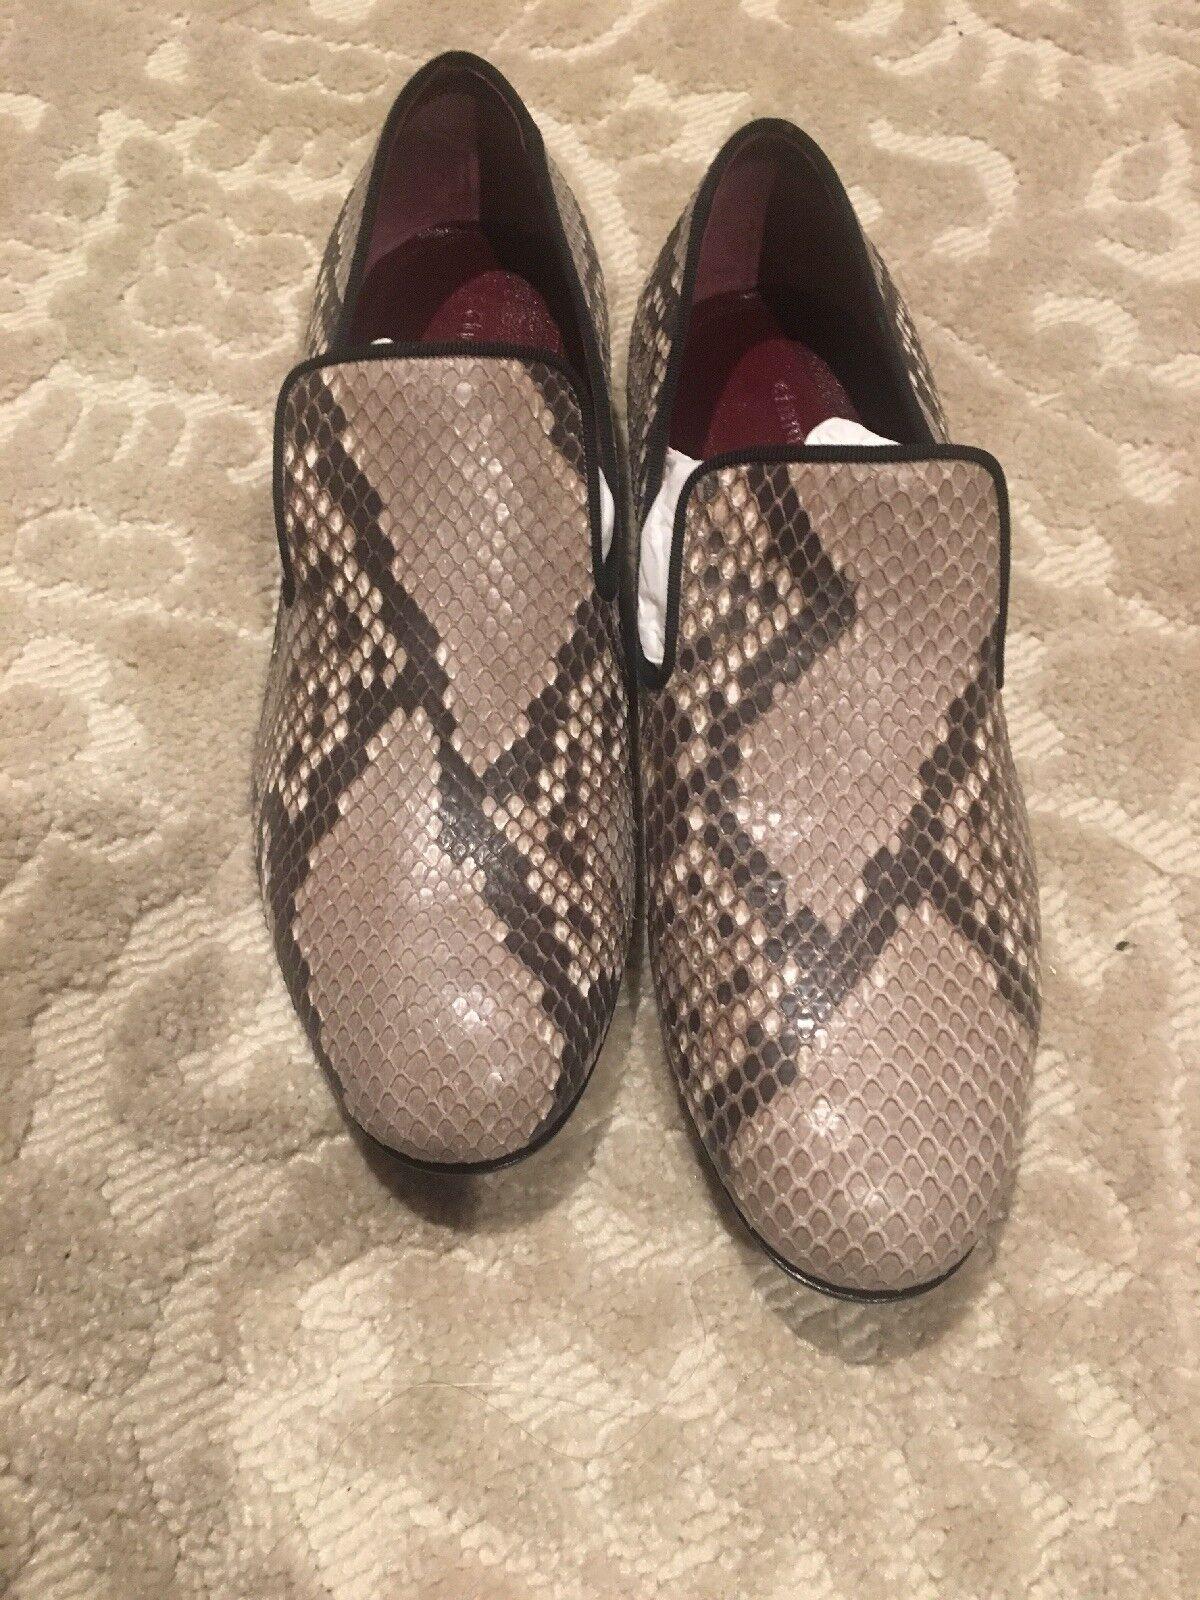 CELINE Paris Snake Skin Loafers - Storlek 6.5 US   36.5 EU - Ny ruta